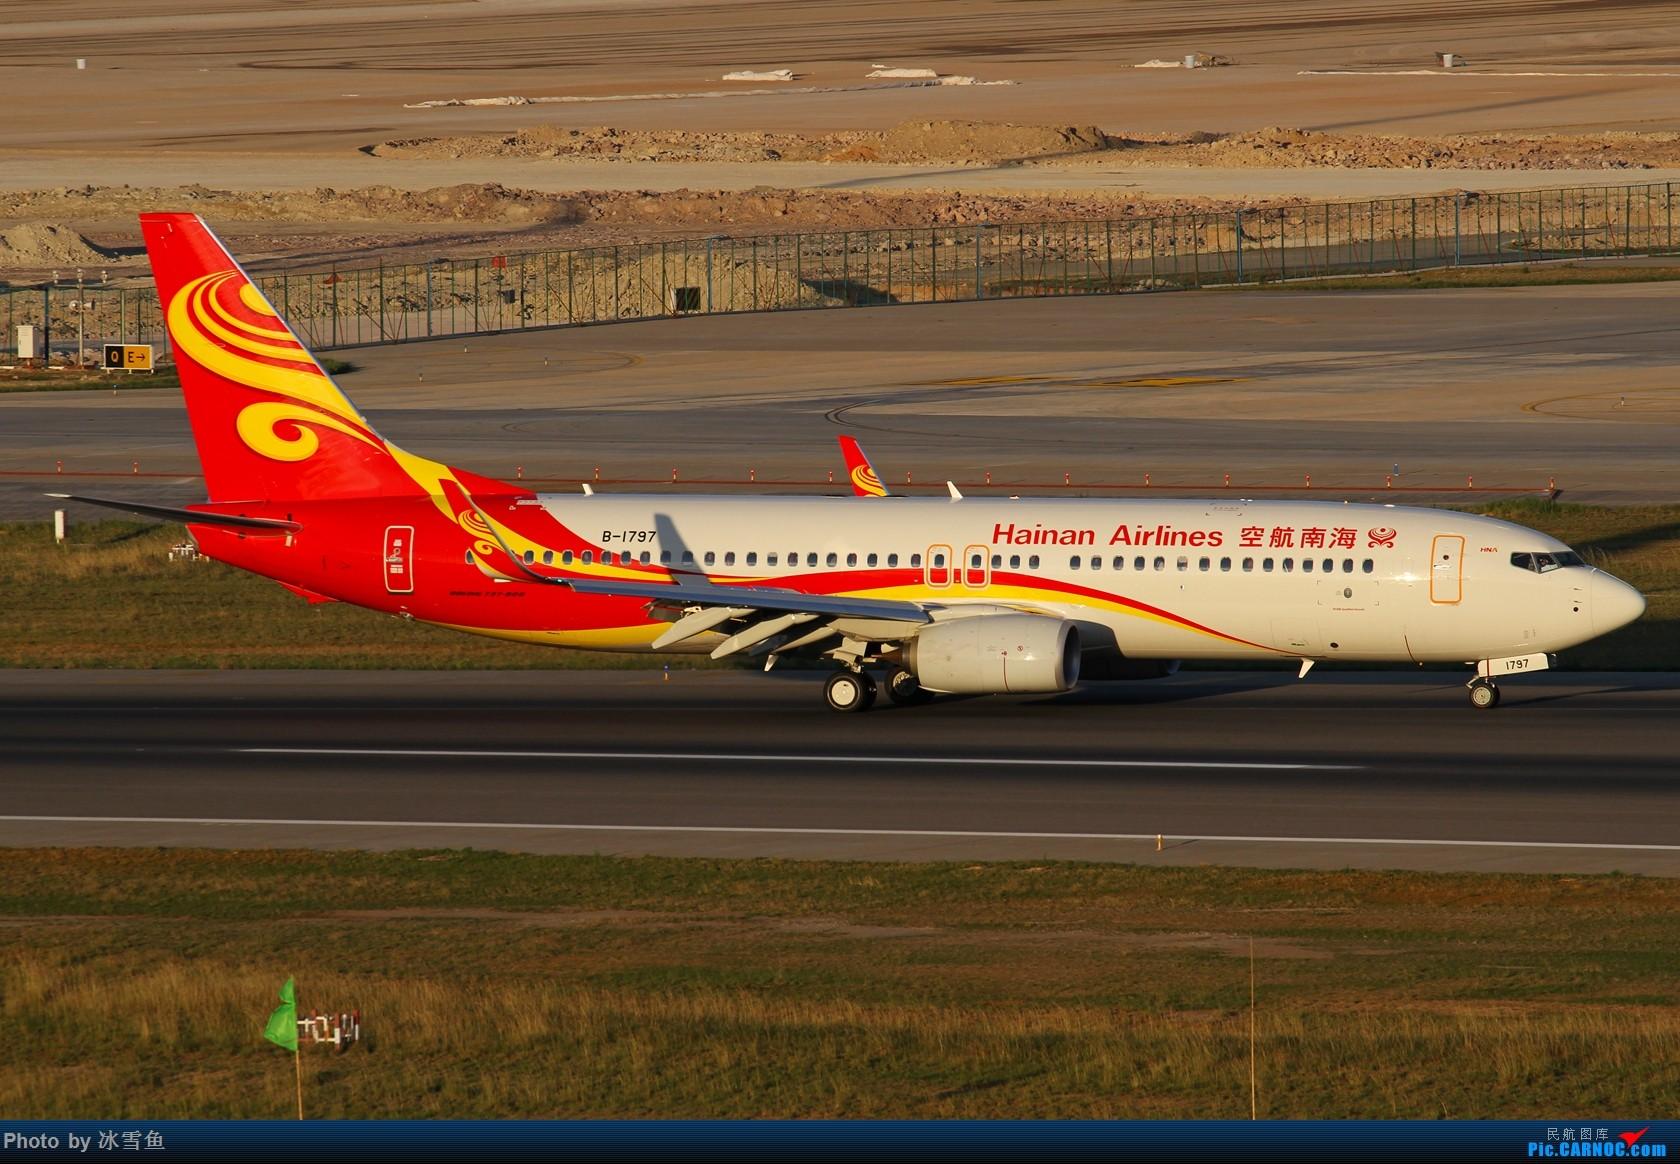 Re:[原创][BLDDQ-昆明飞友会]弹指一挥间在本论坛混了10年了! BOEING 737-800 B-1797 中国昆明长水国际机场